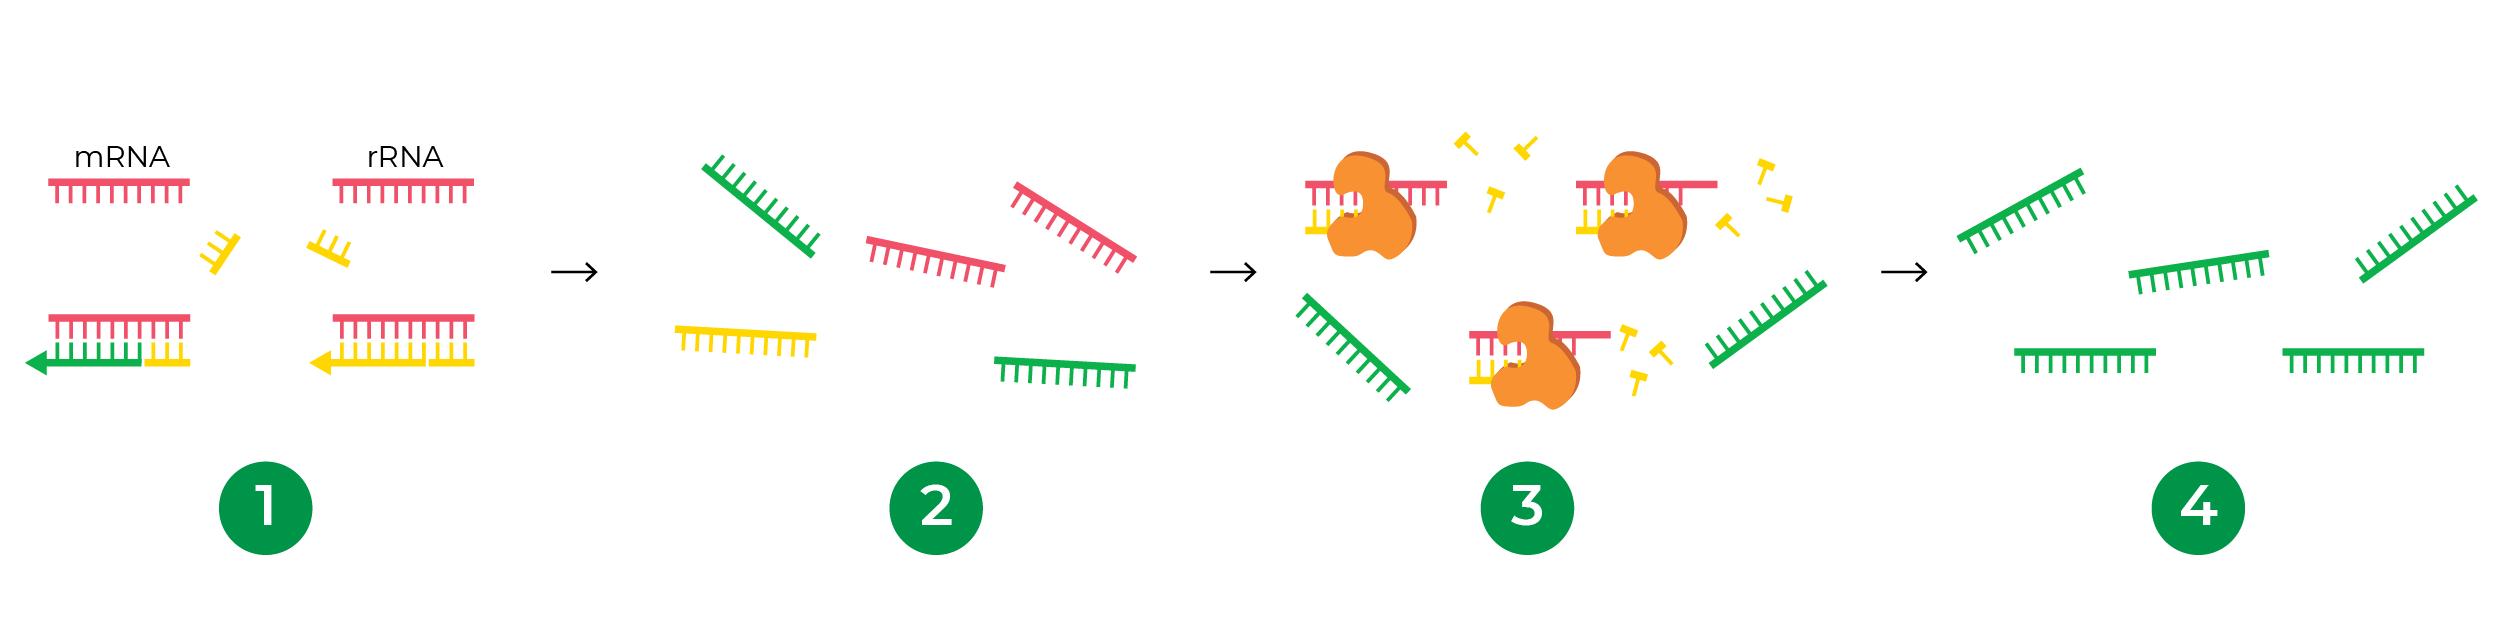 Figure showing ZymoSEQ RiboFree